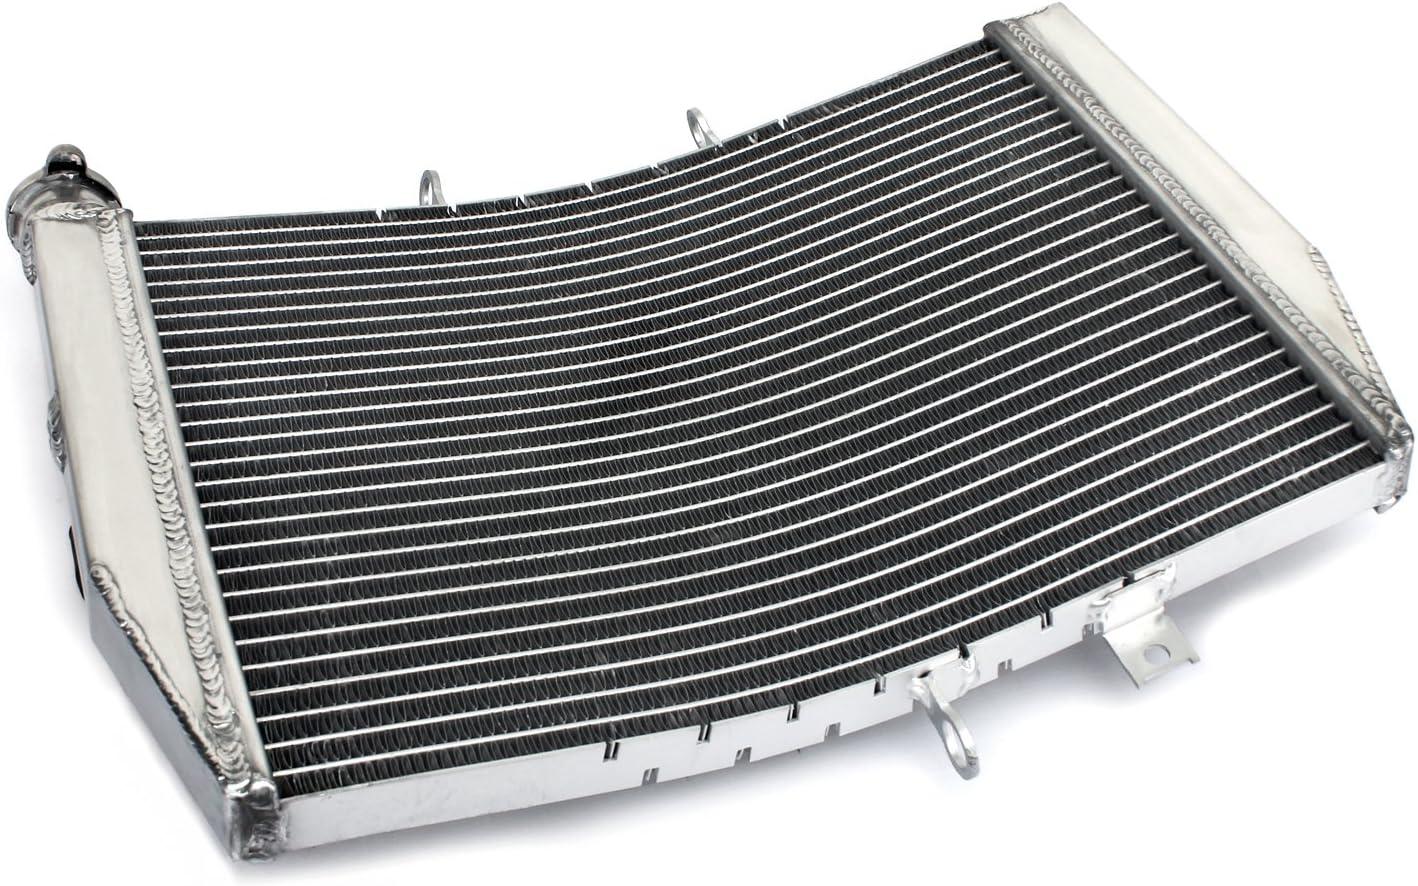 TARAZON Moto alluminio radiatori radiatore di raffreddamento motore per Kawasaki Ninja ZX10R ZX-10R 2006 2007